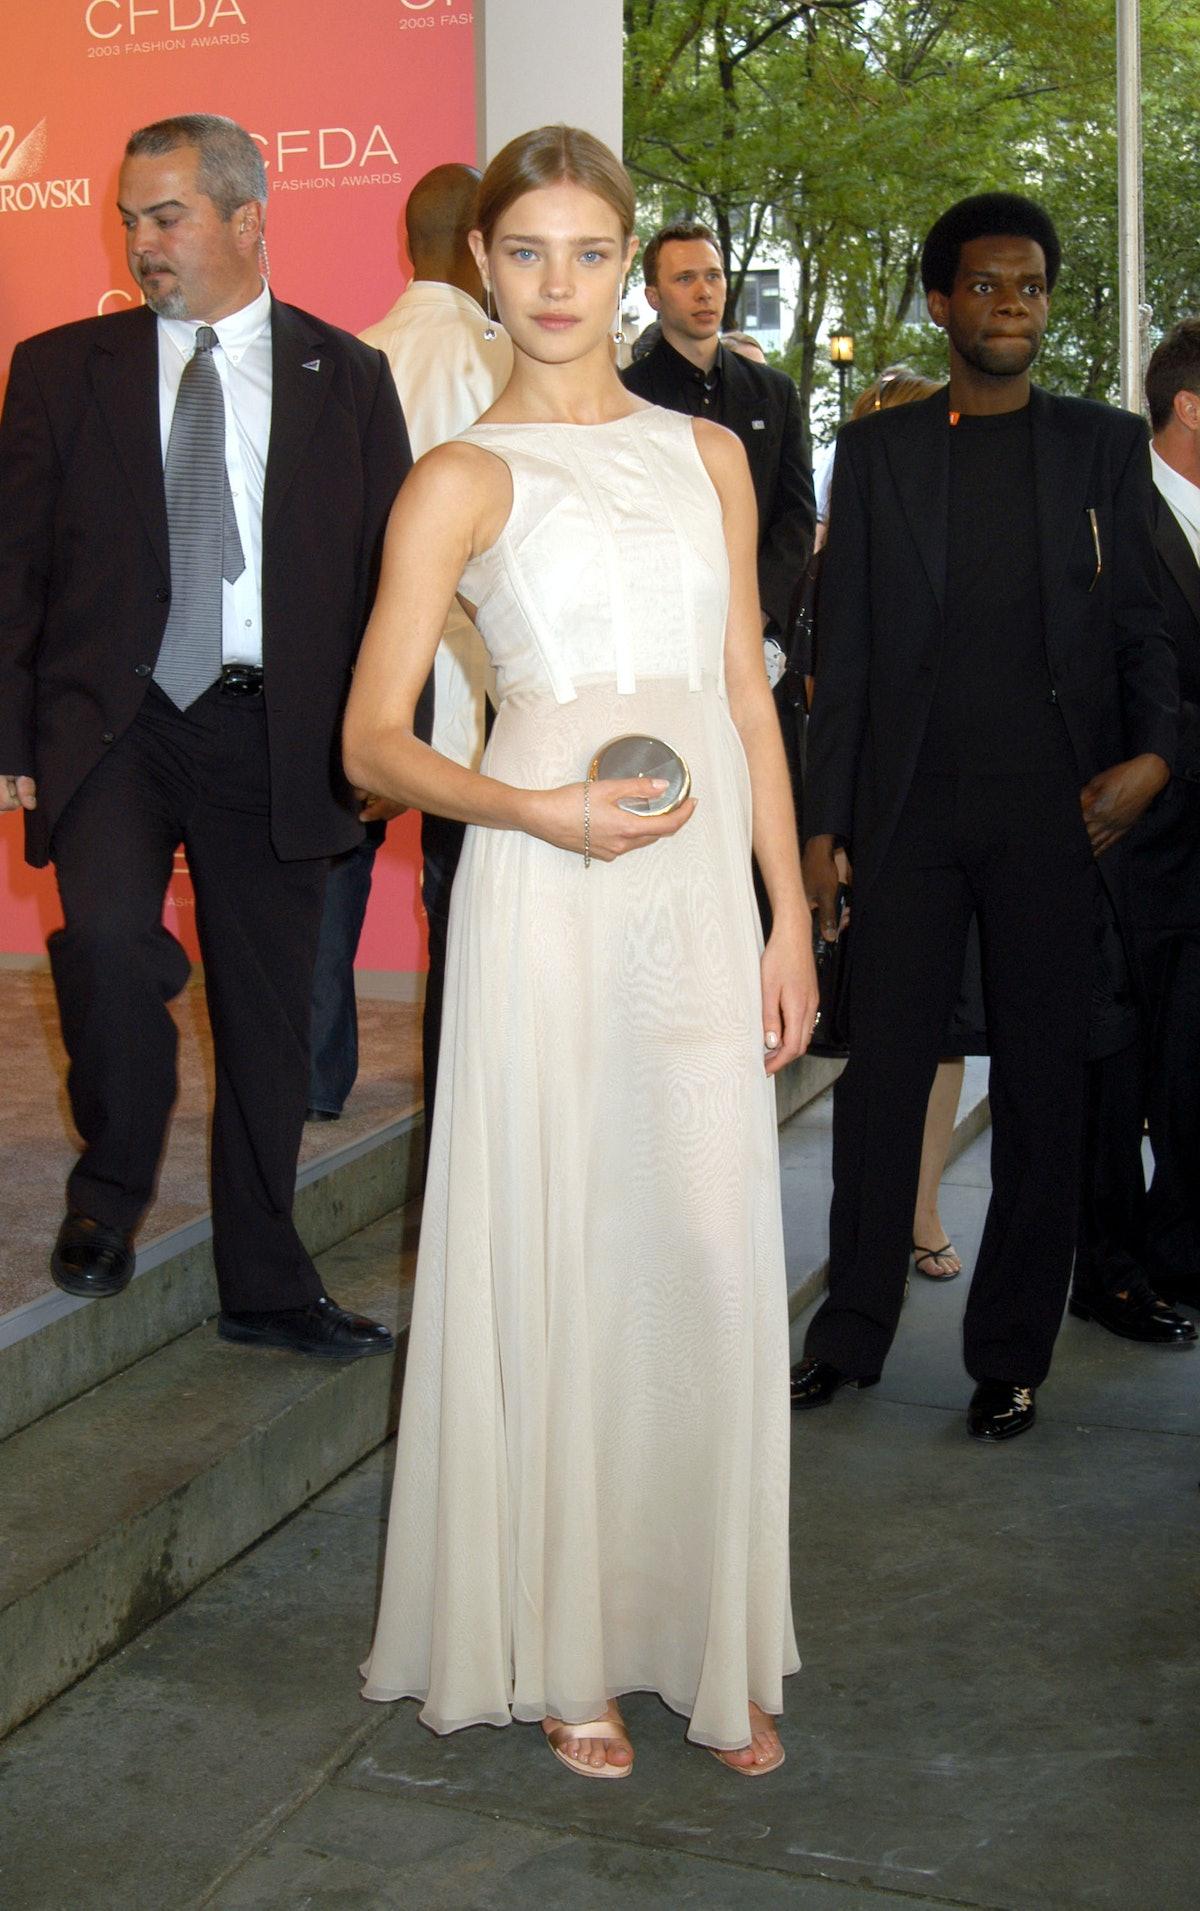 The 2003 CFDA Fashion Awards - Arrivals